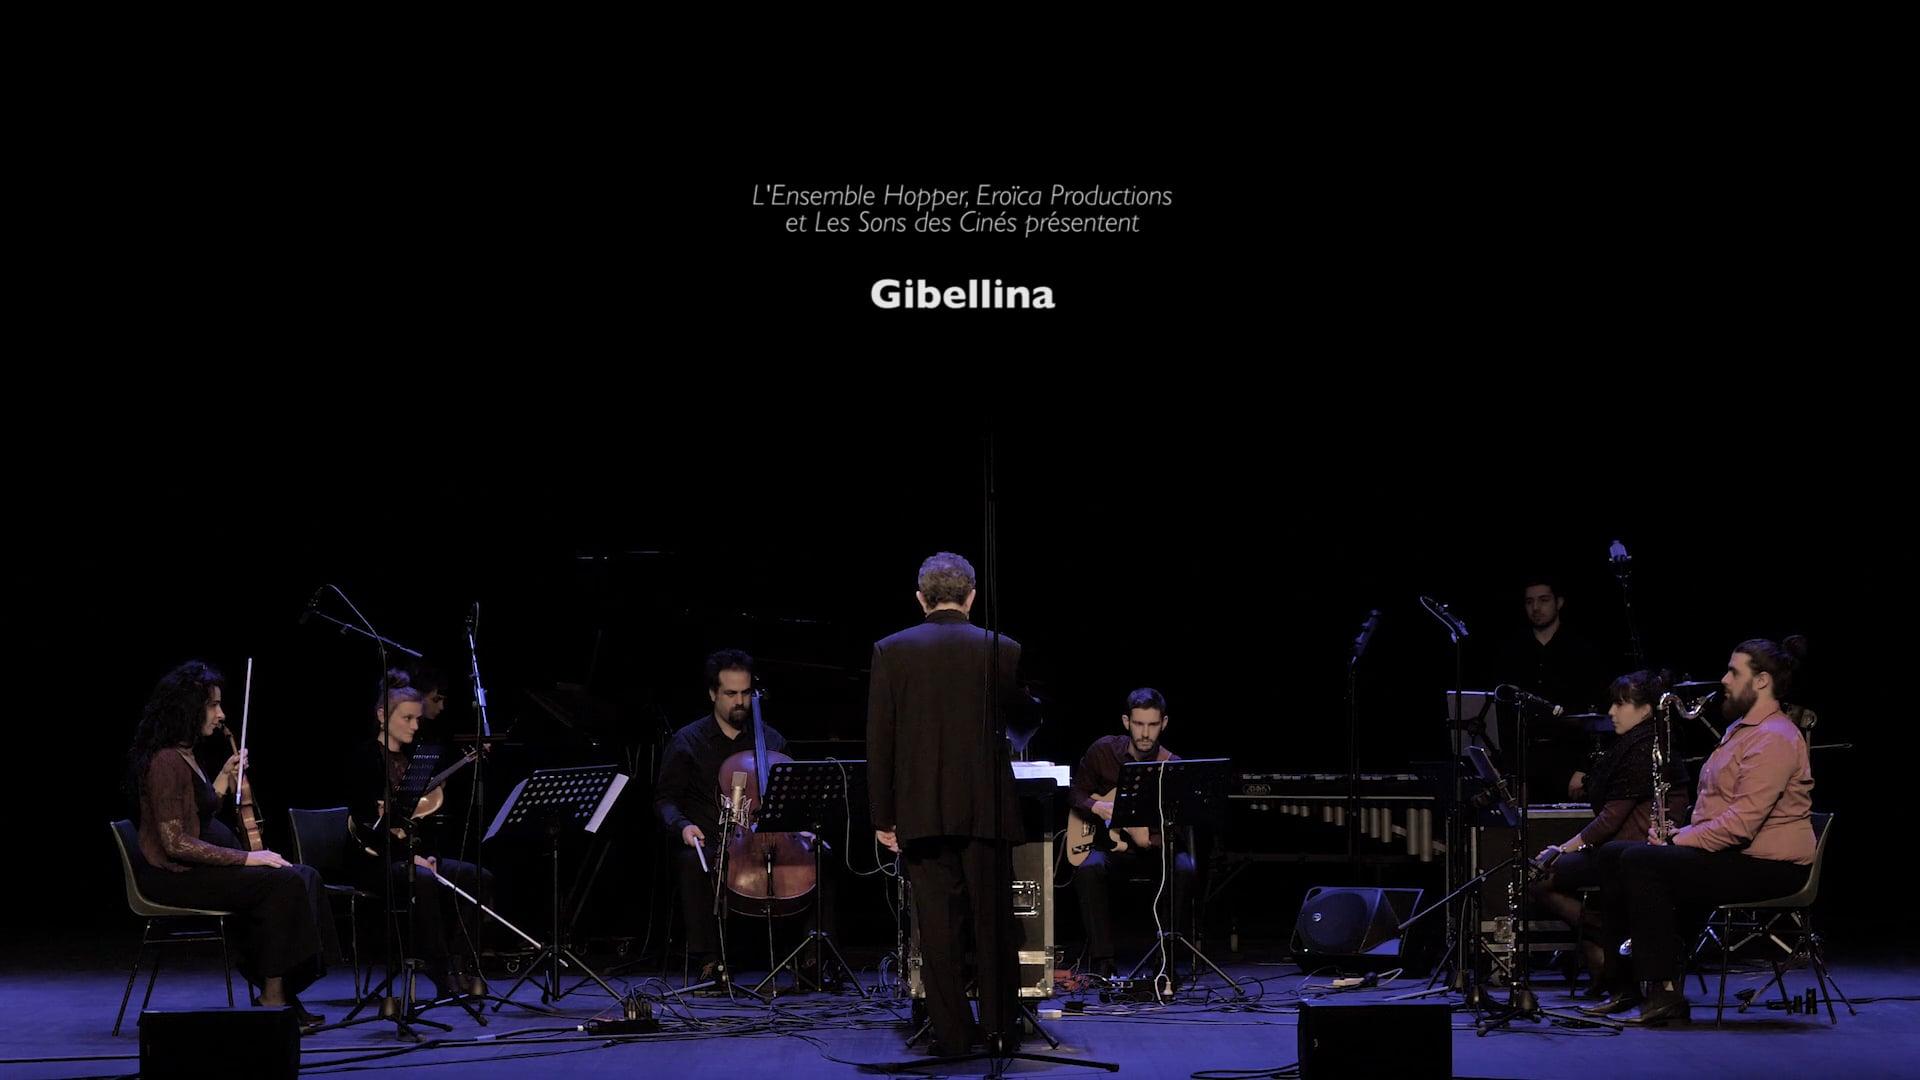 Gibellina, film de Thierry De Mey musique de Stéphane Orlando par l'Ensemble Hopper 2021.mp4